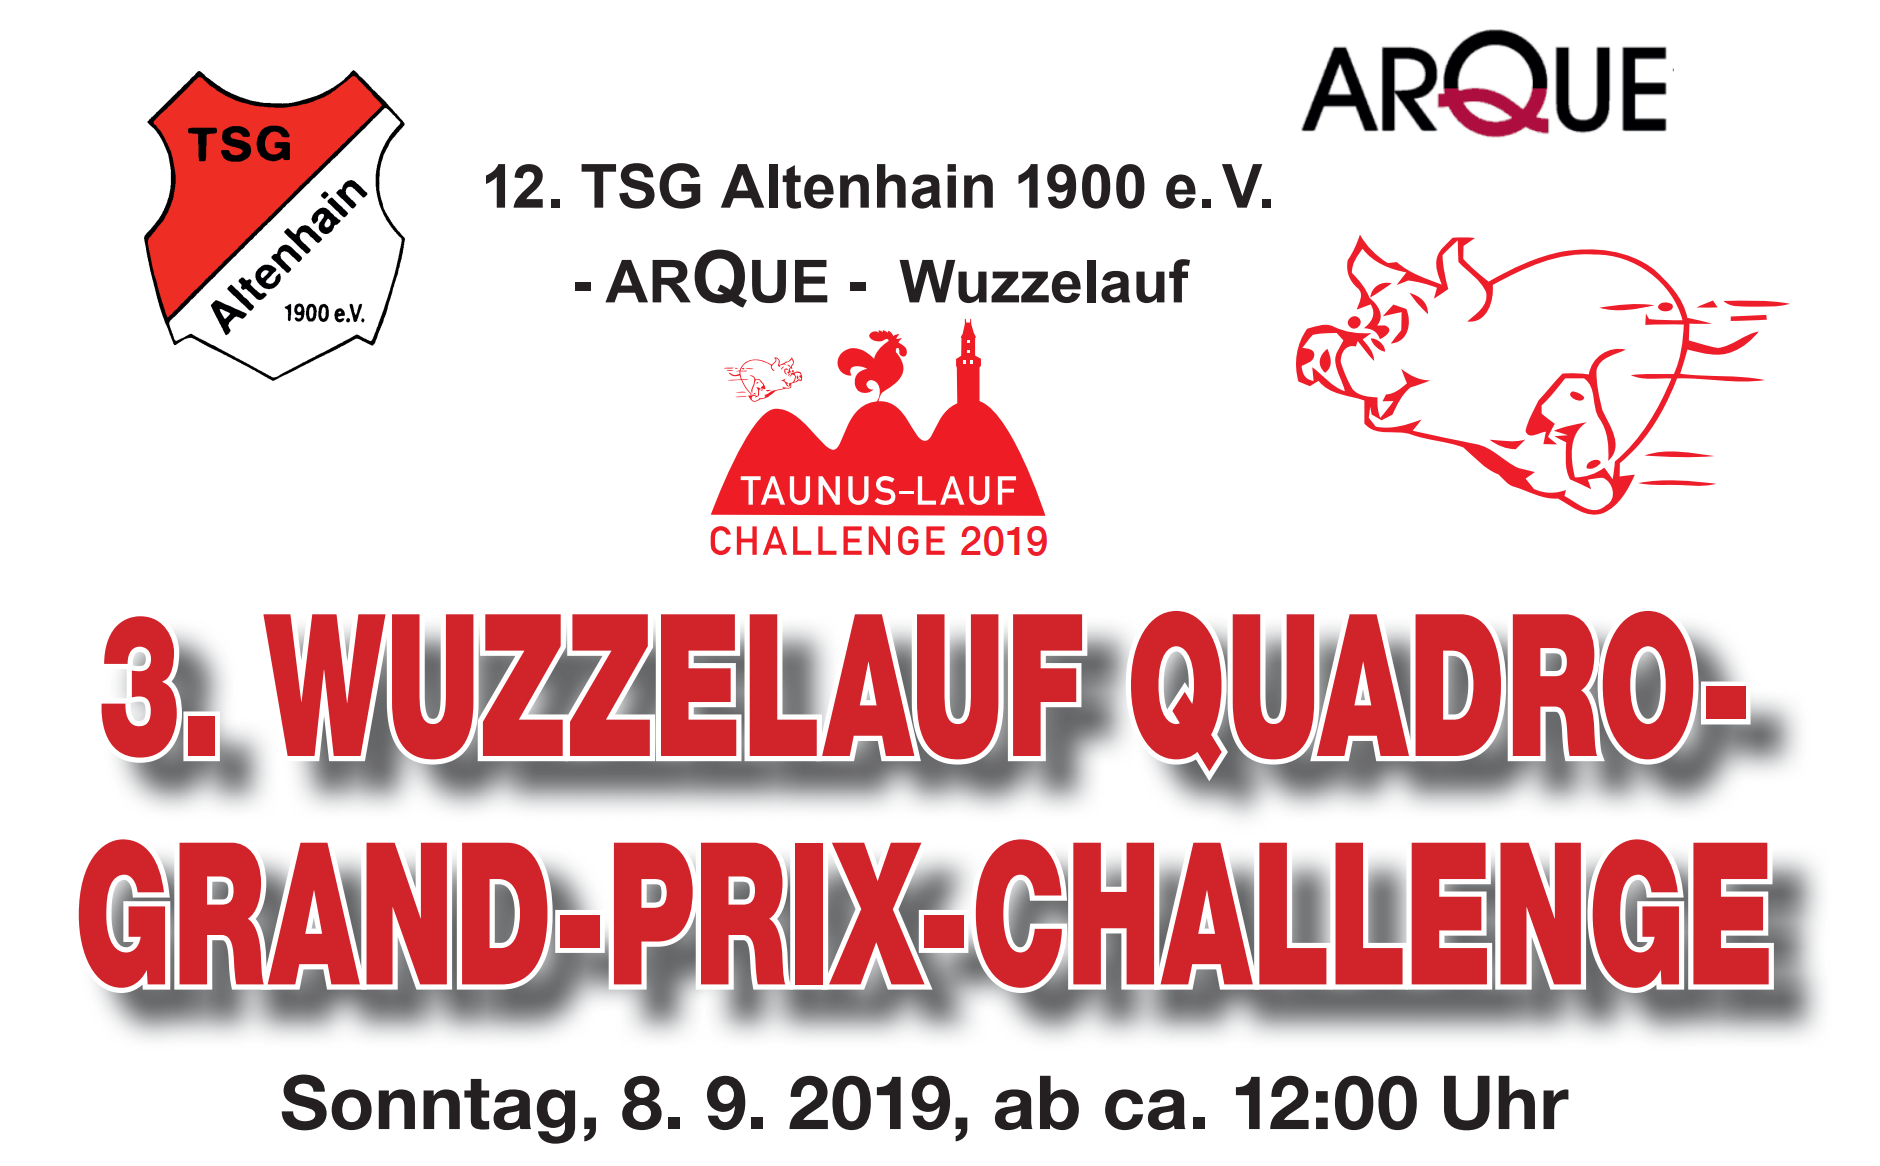 Wuzzelauf-Quadro-GP-Challenge